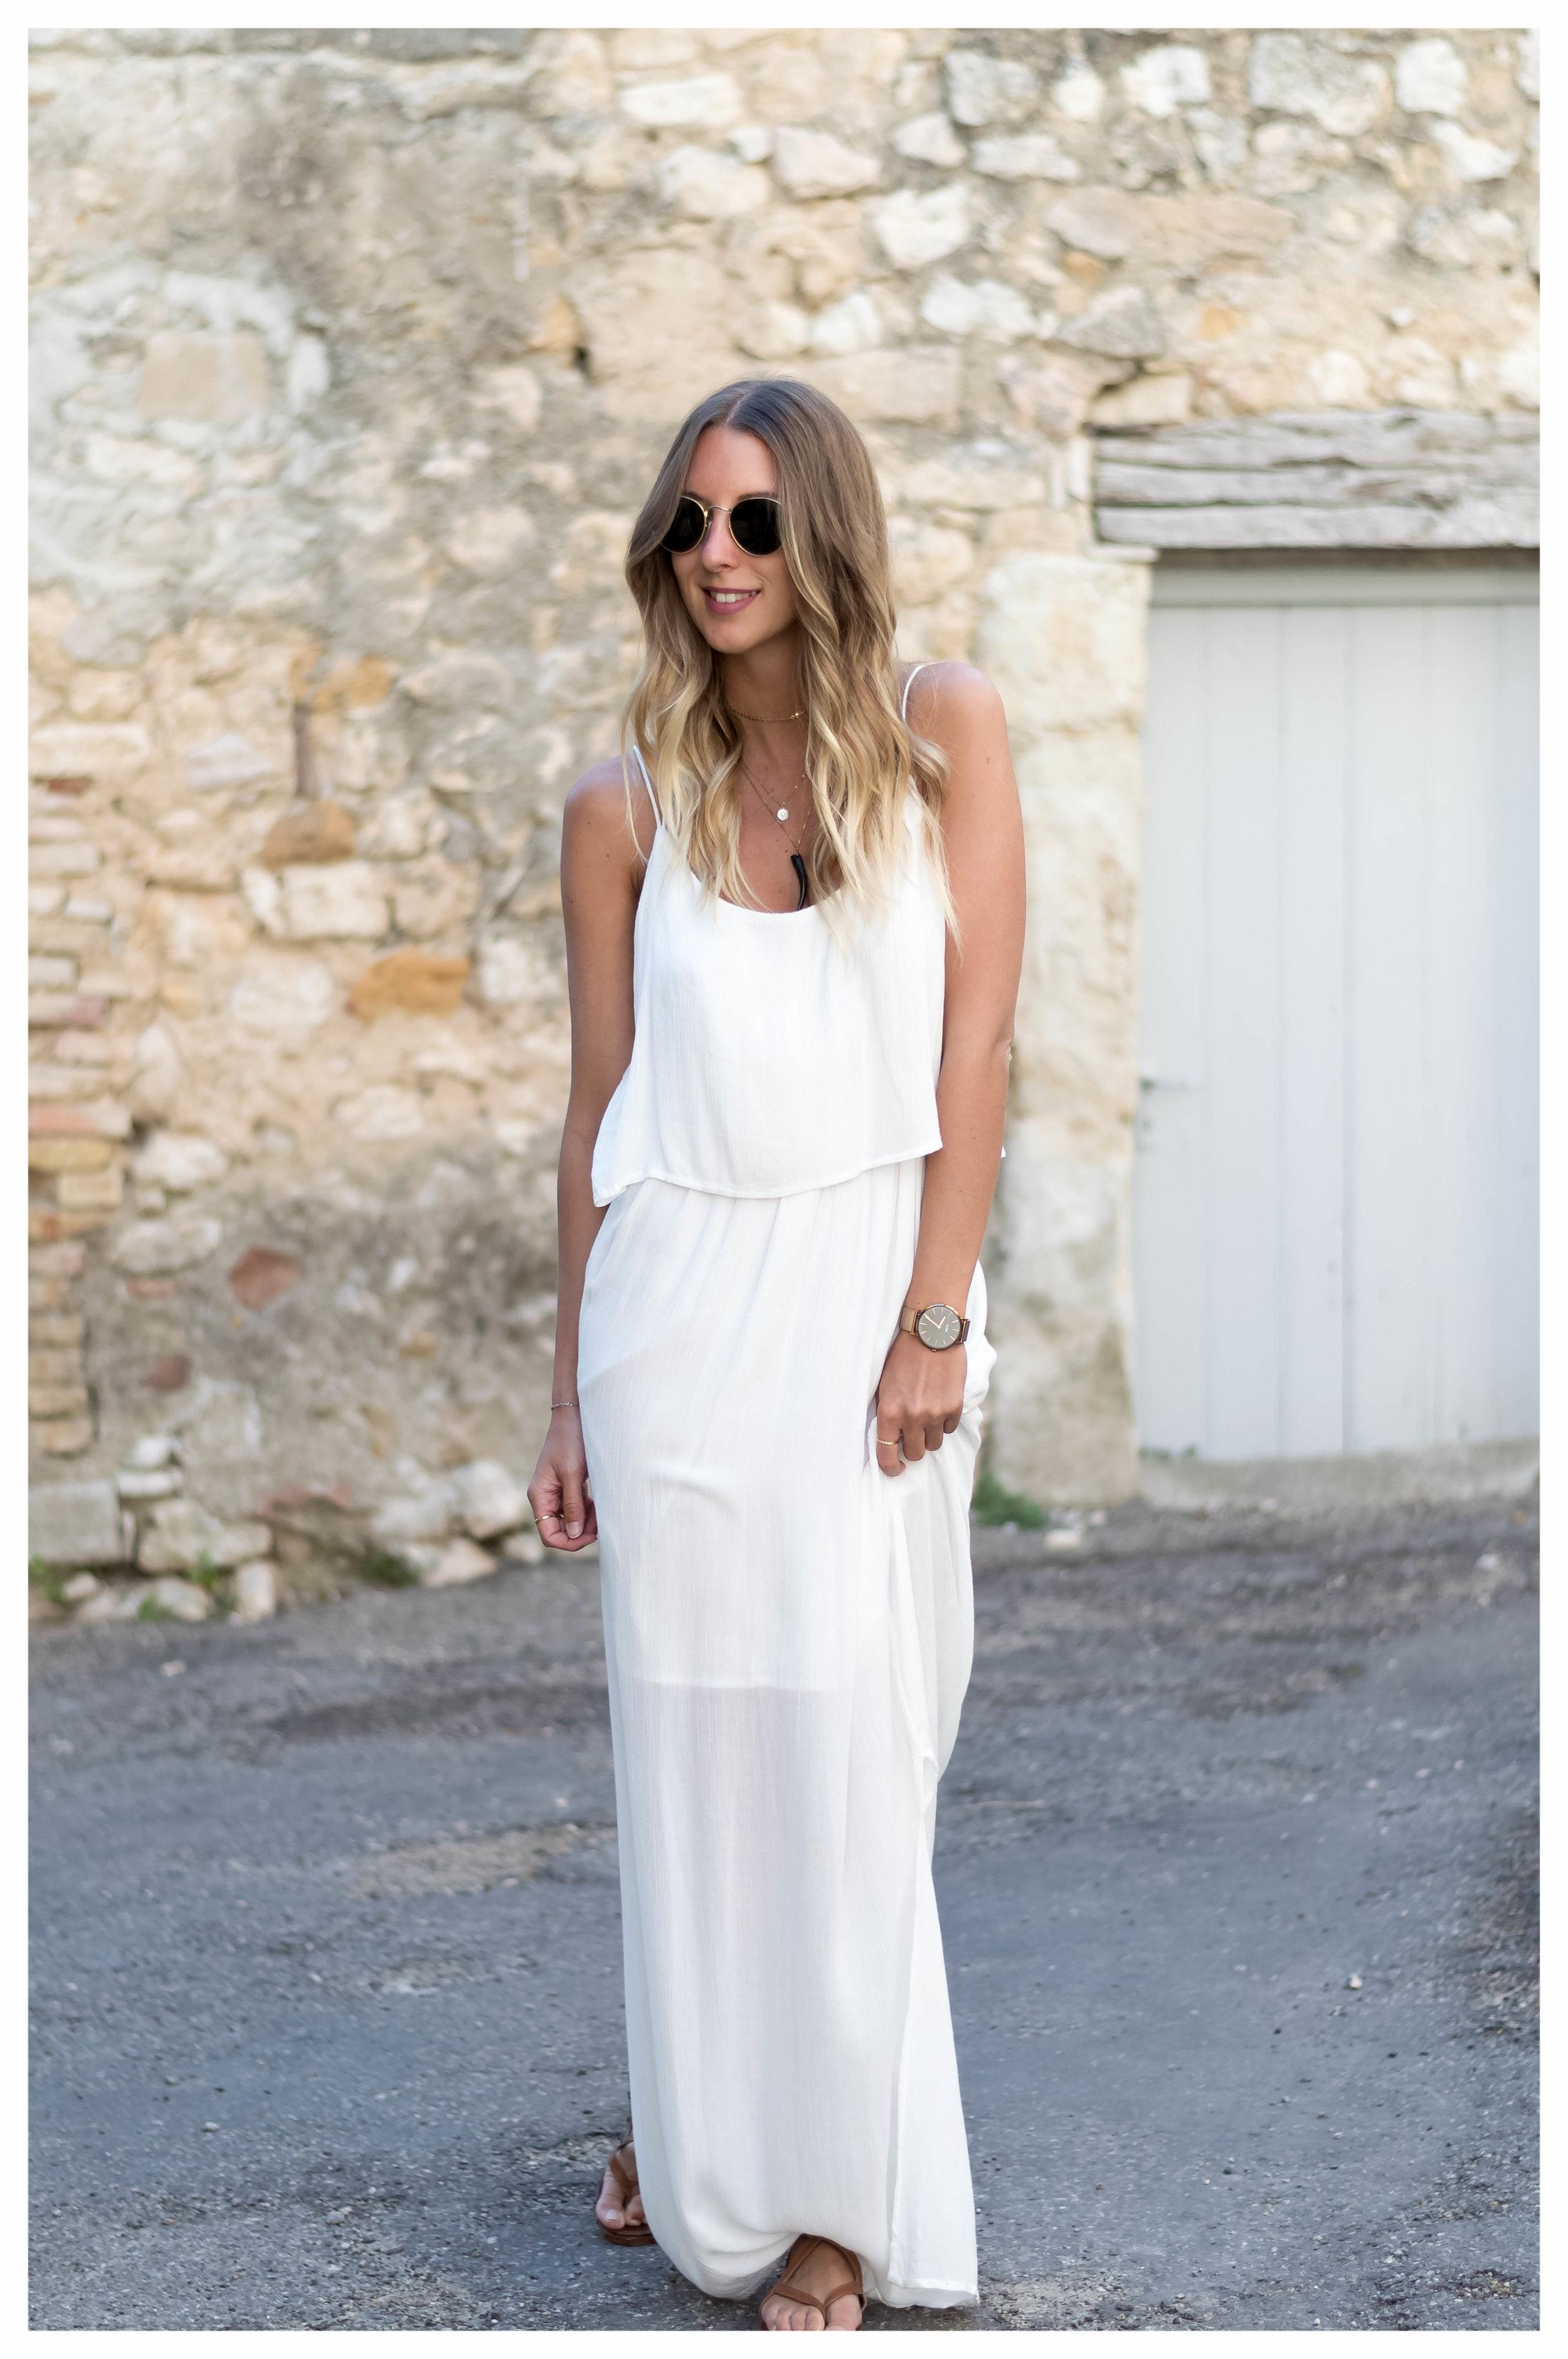 White Dress - OSIARAH.COM (5 sur 16).jpg